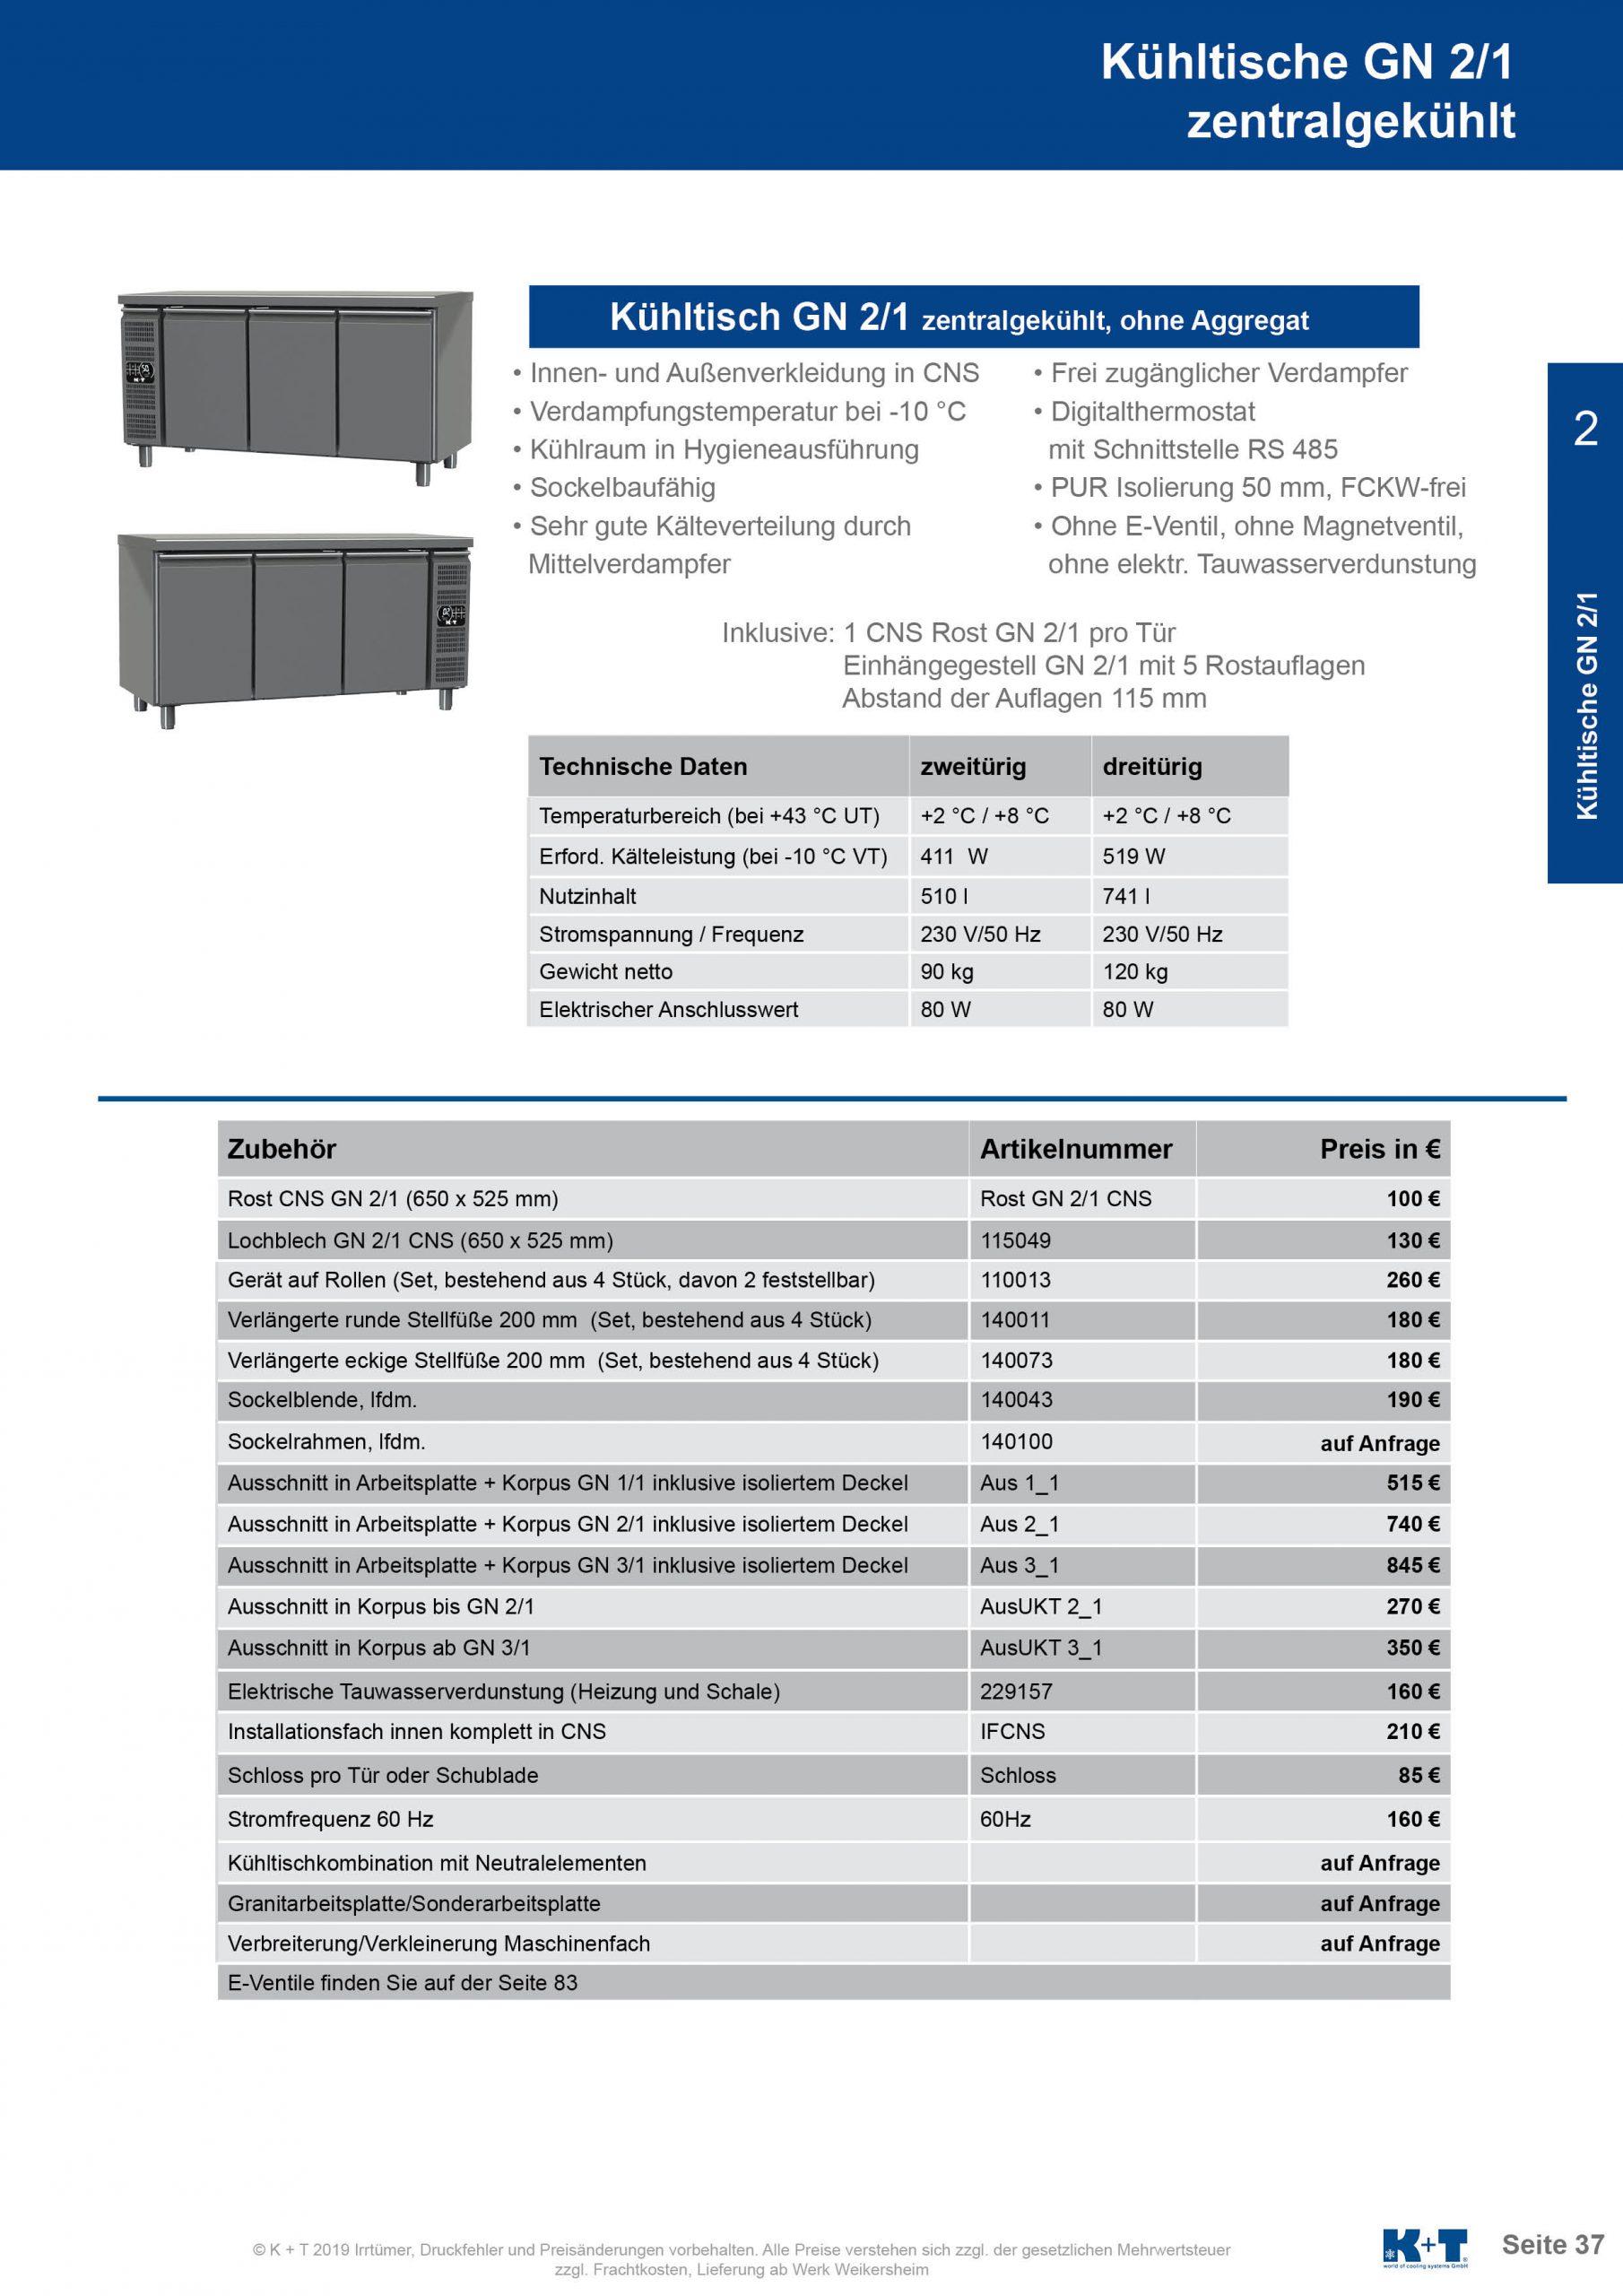 Kühltisch GN 2_1 Korpus 700 zentralgekühlt 2